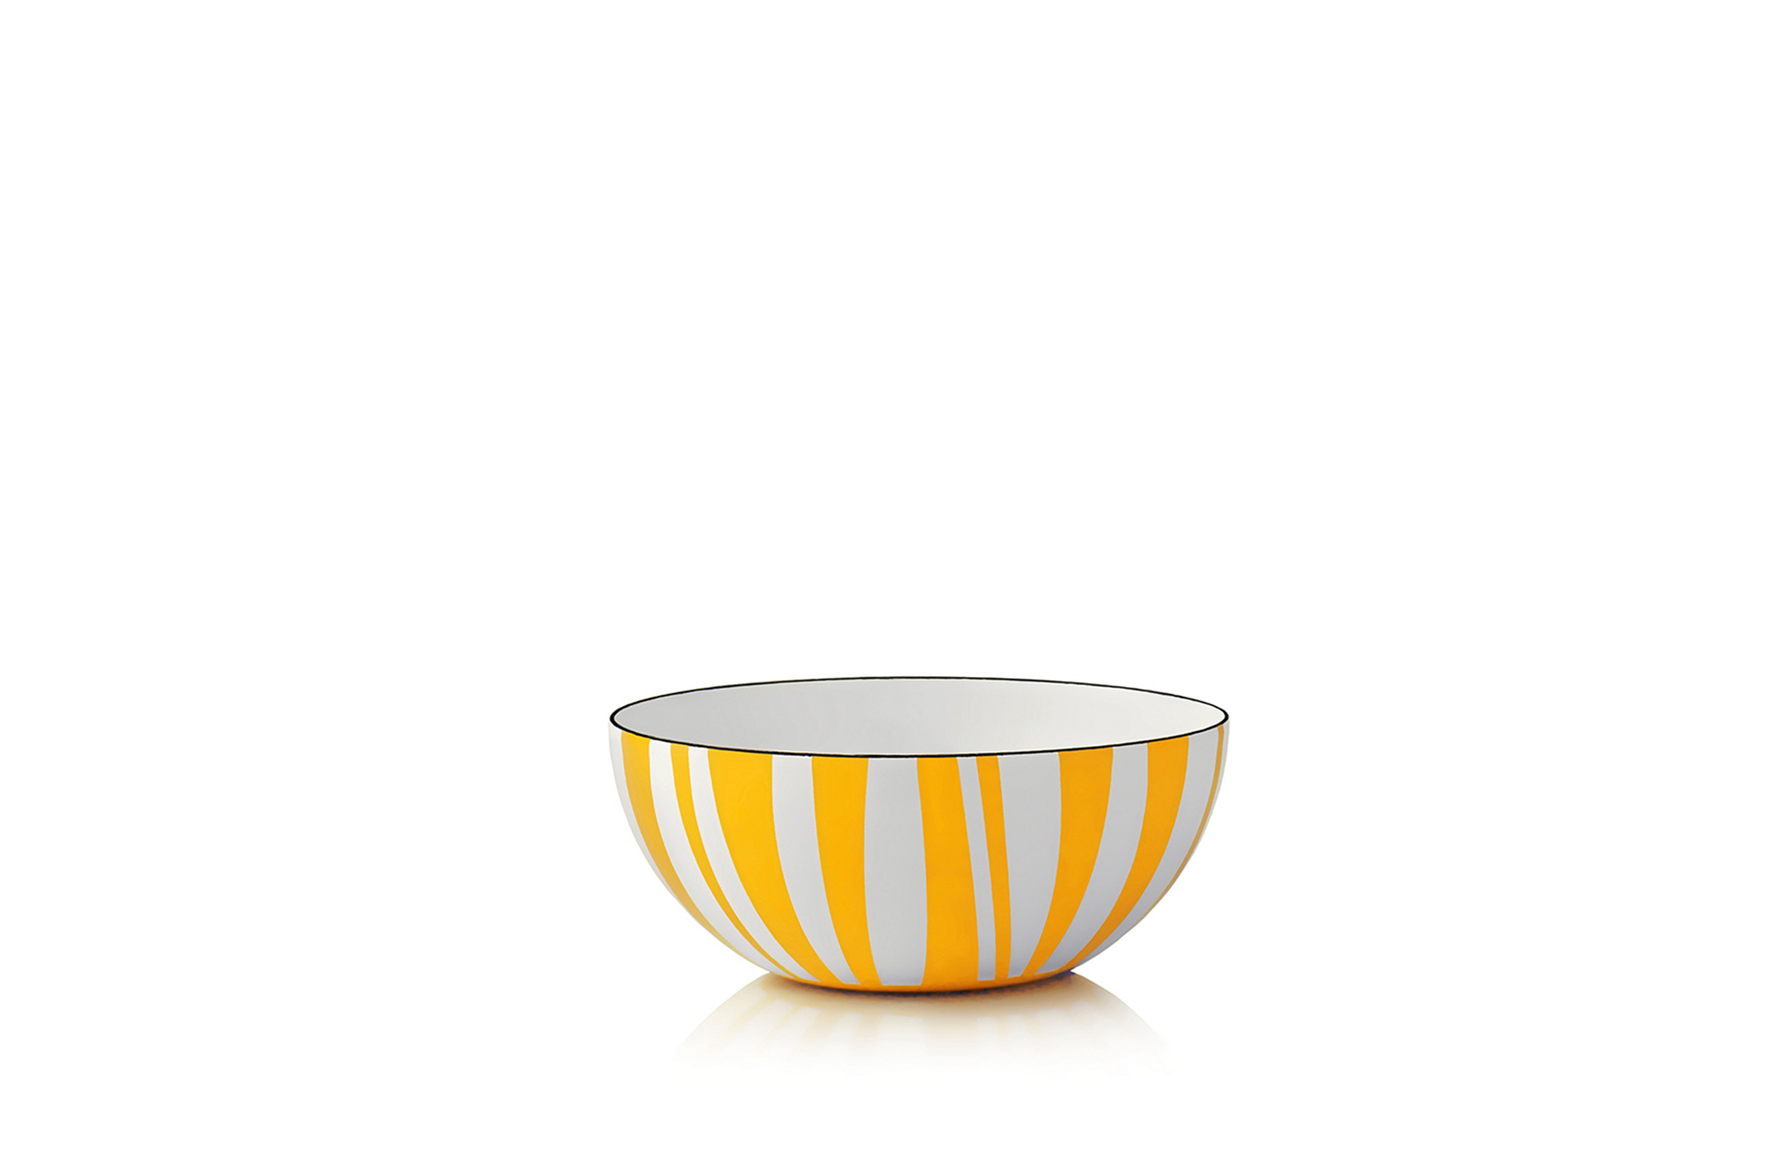 10 cm - Stripes collectionYellow